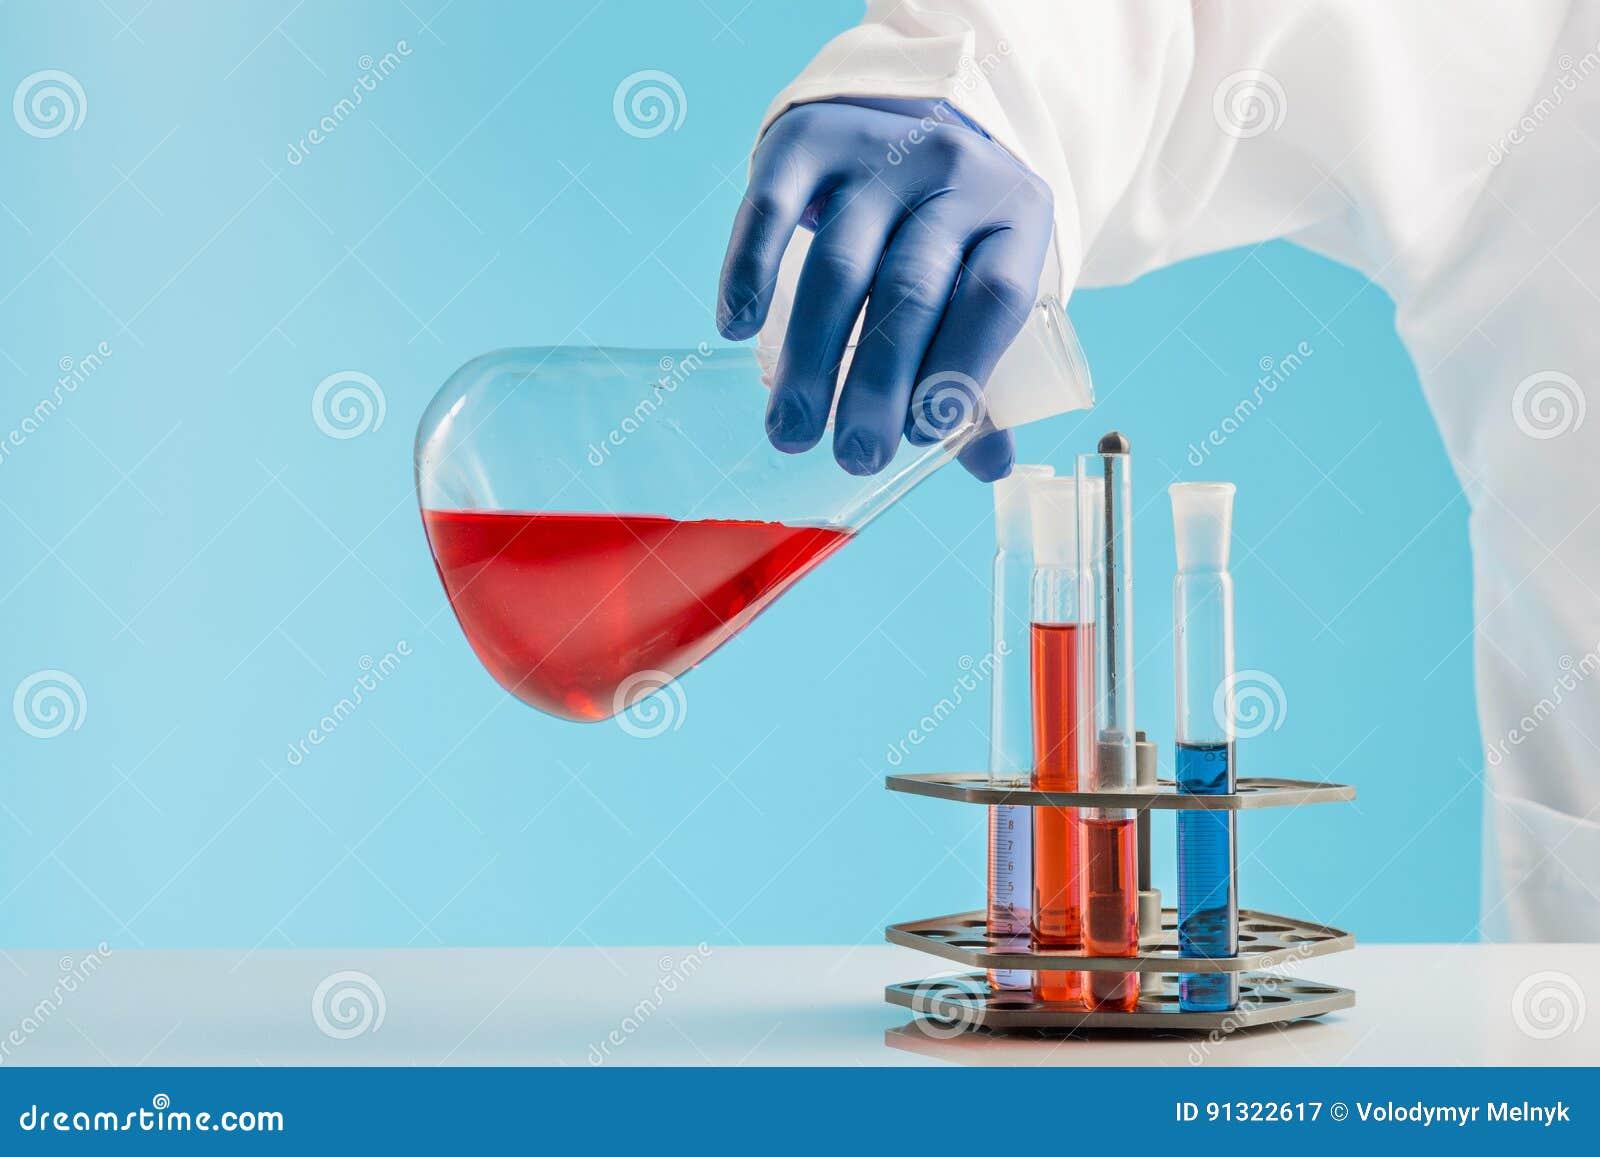 Experiment i en kemilabb föra ett experiment i laboratoriumet